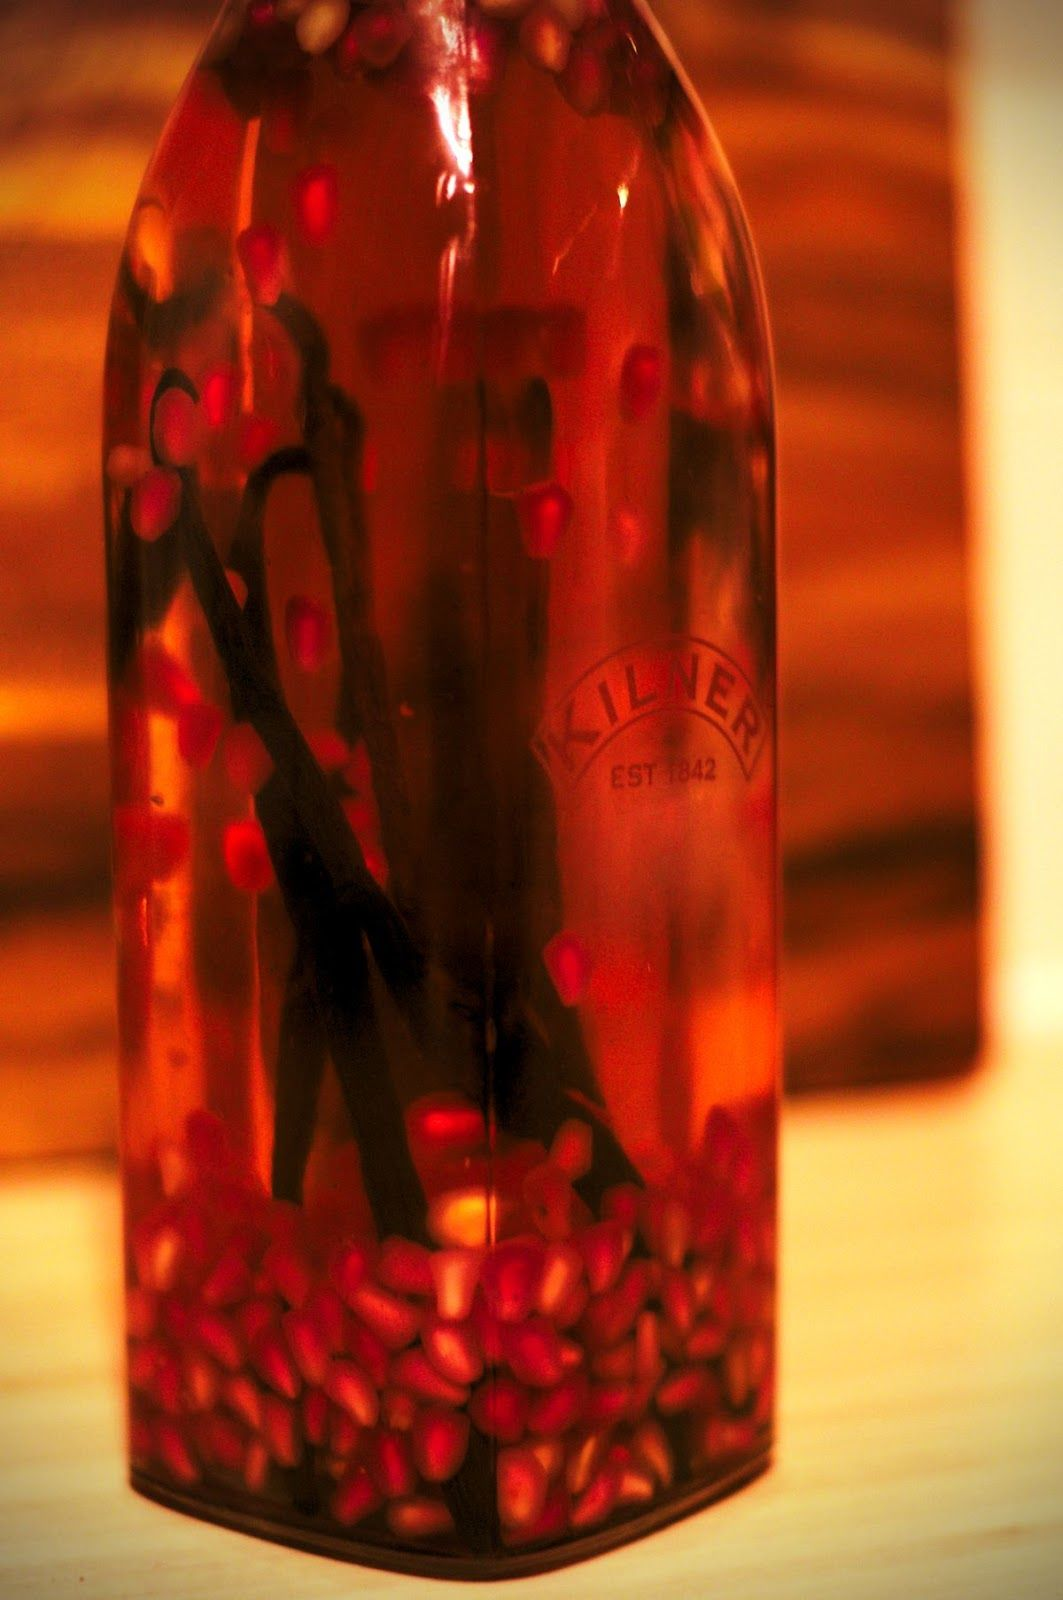 Pomegranate and vanilla vodka http://lavender-kitchen.blogspot.co.uk/2012/12/pomegranate-vanilla-vodka.html?m=1